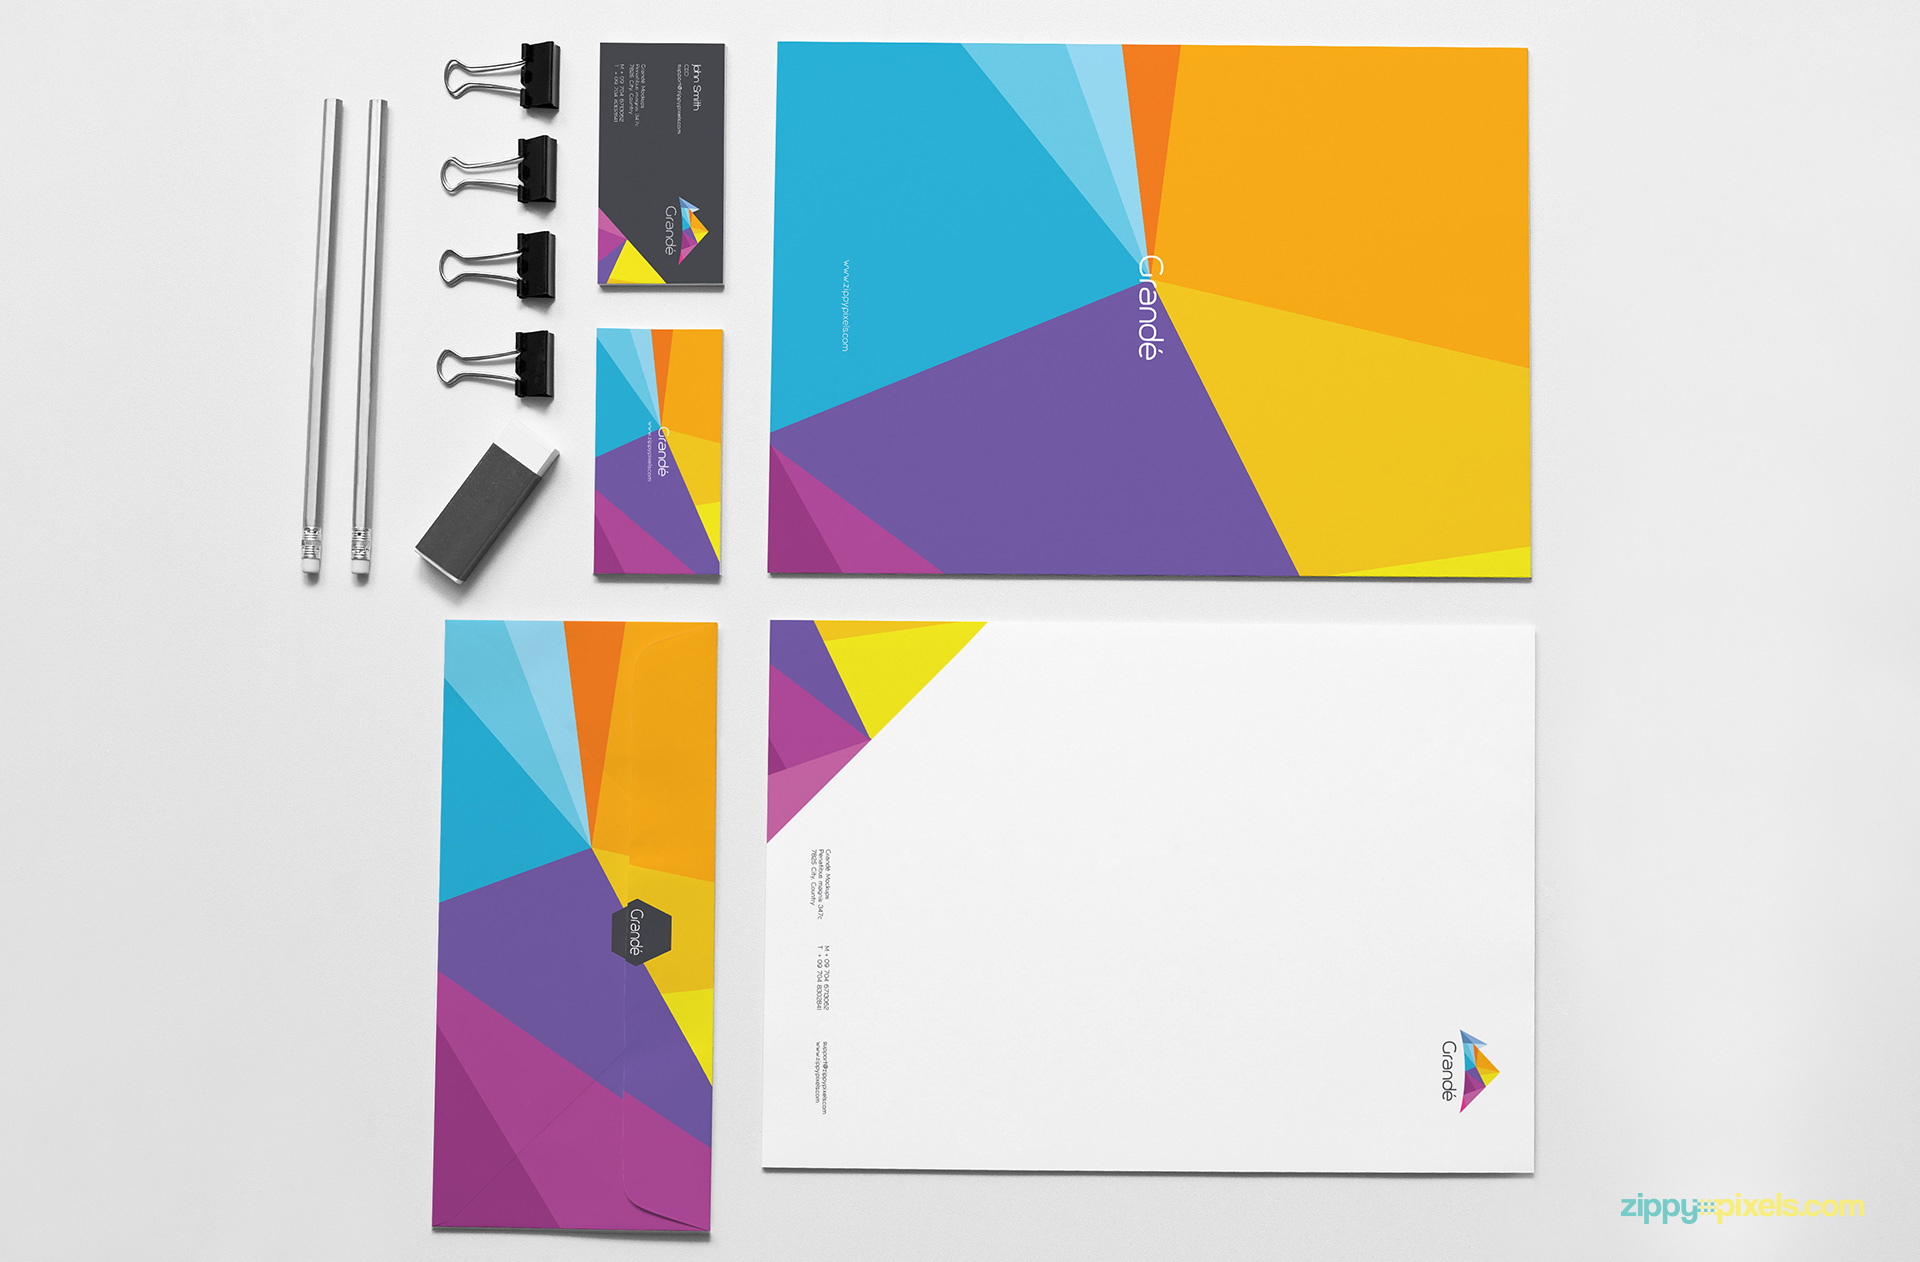 Stationery Item Set of Letterhead, Business Cards & Envelope for Brand Identity Mockup